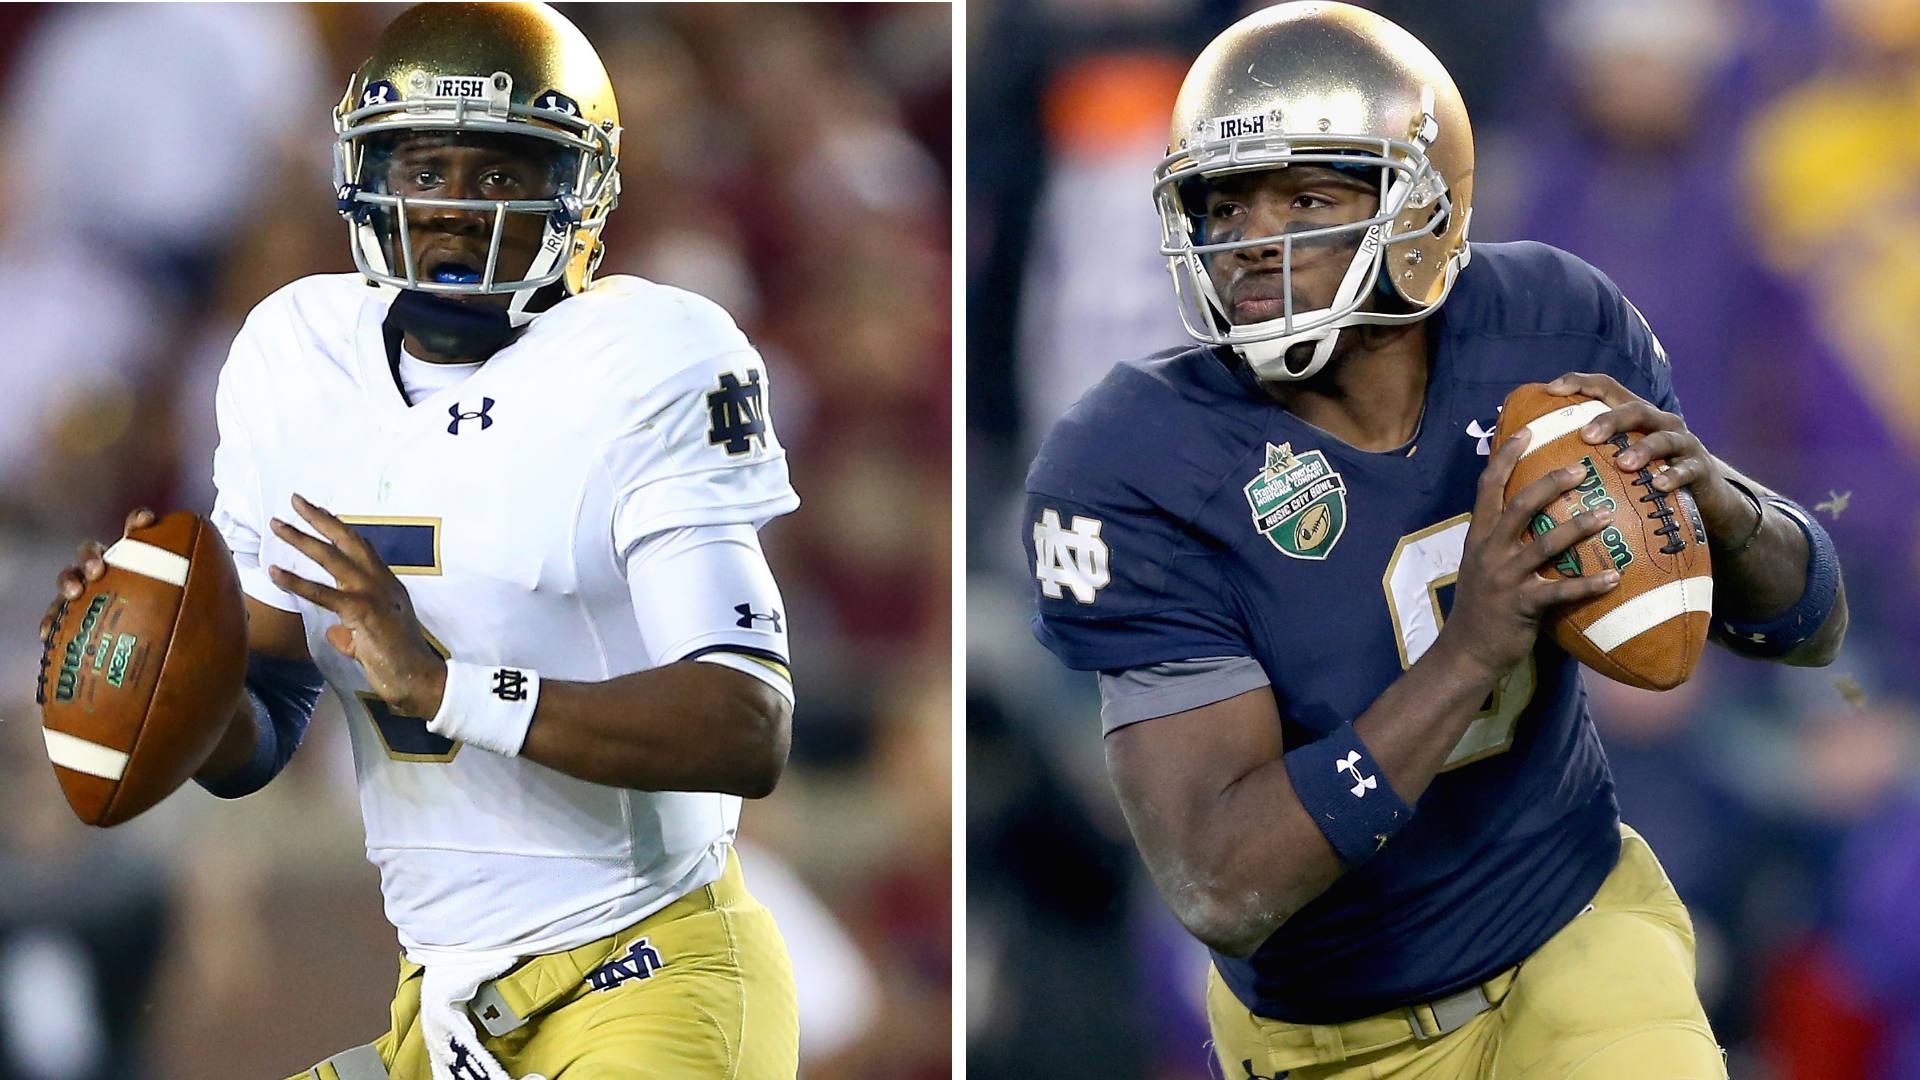 Saturday's games: Penn State O-line, Irish QBs, Auburn RBs on our radar